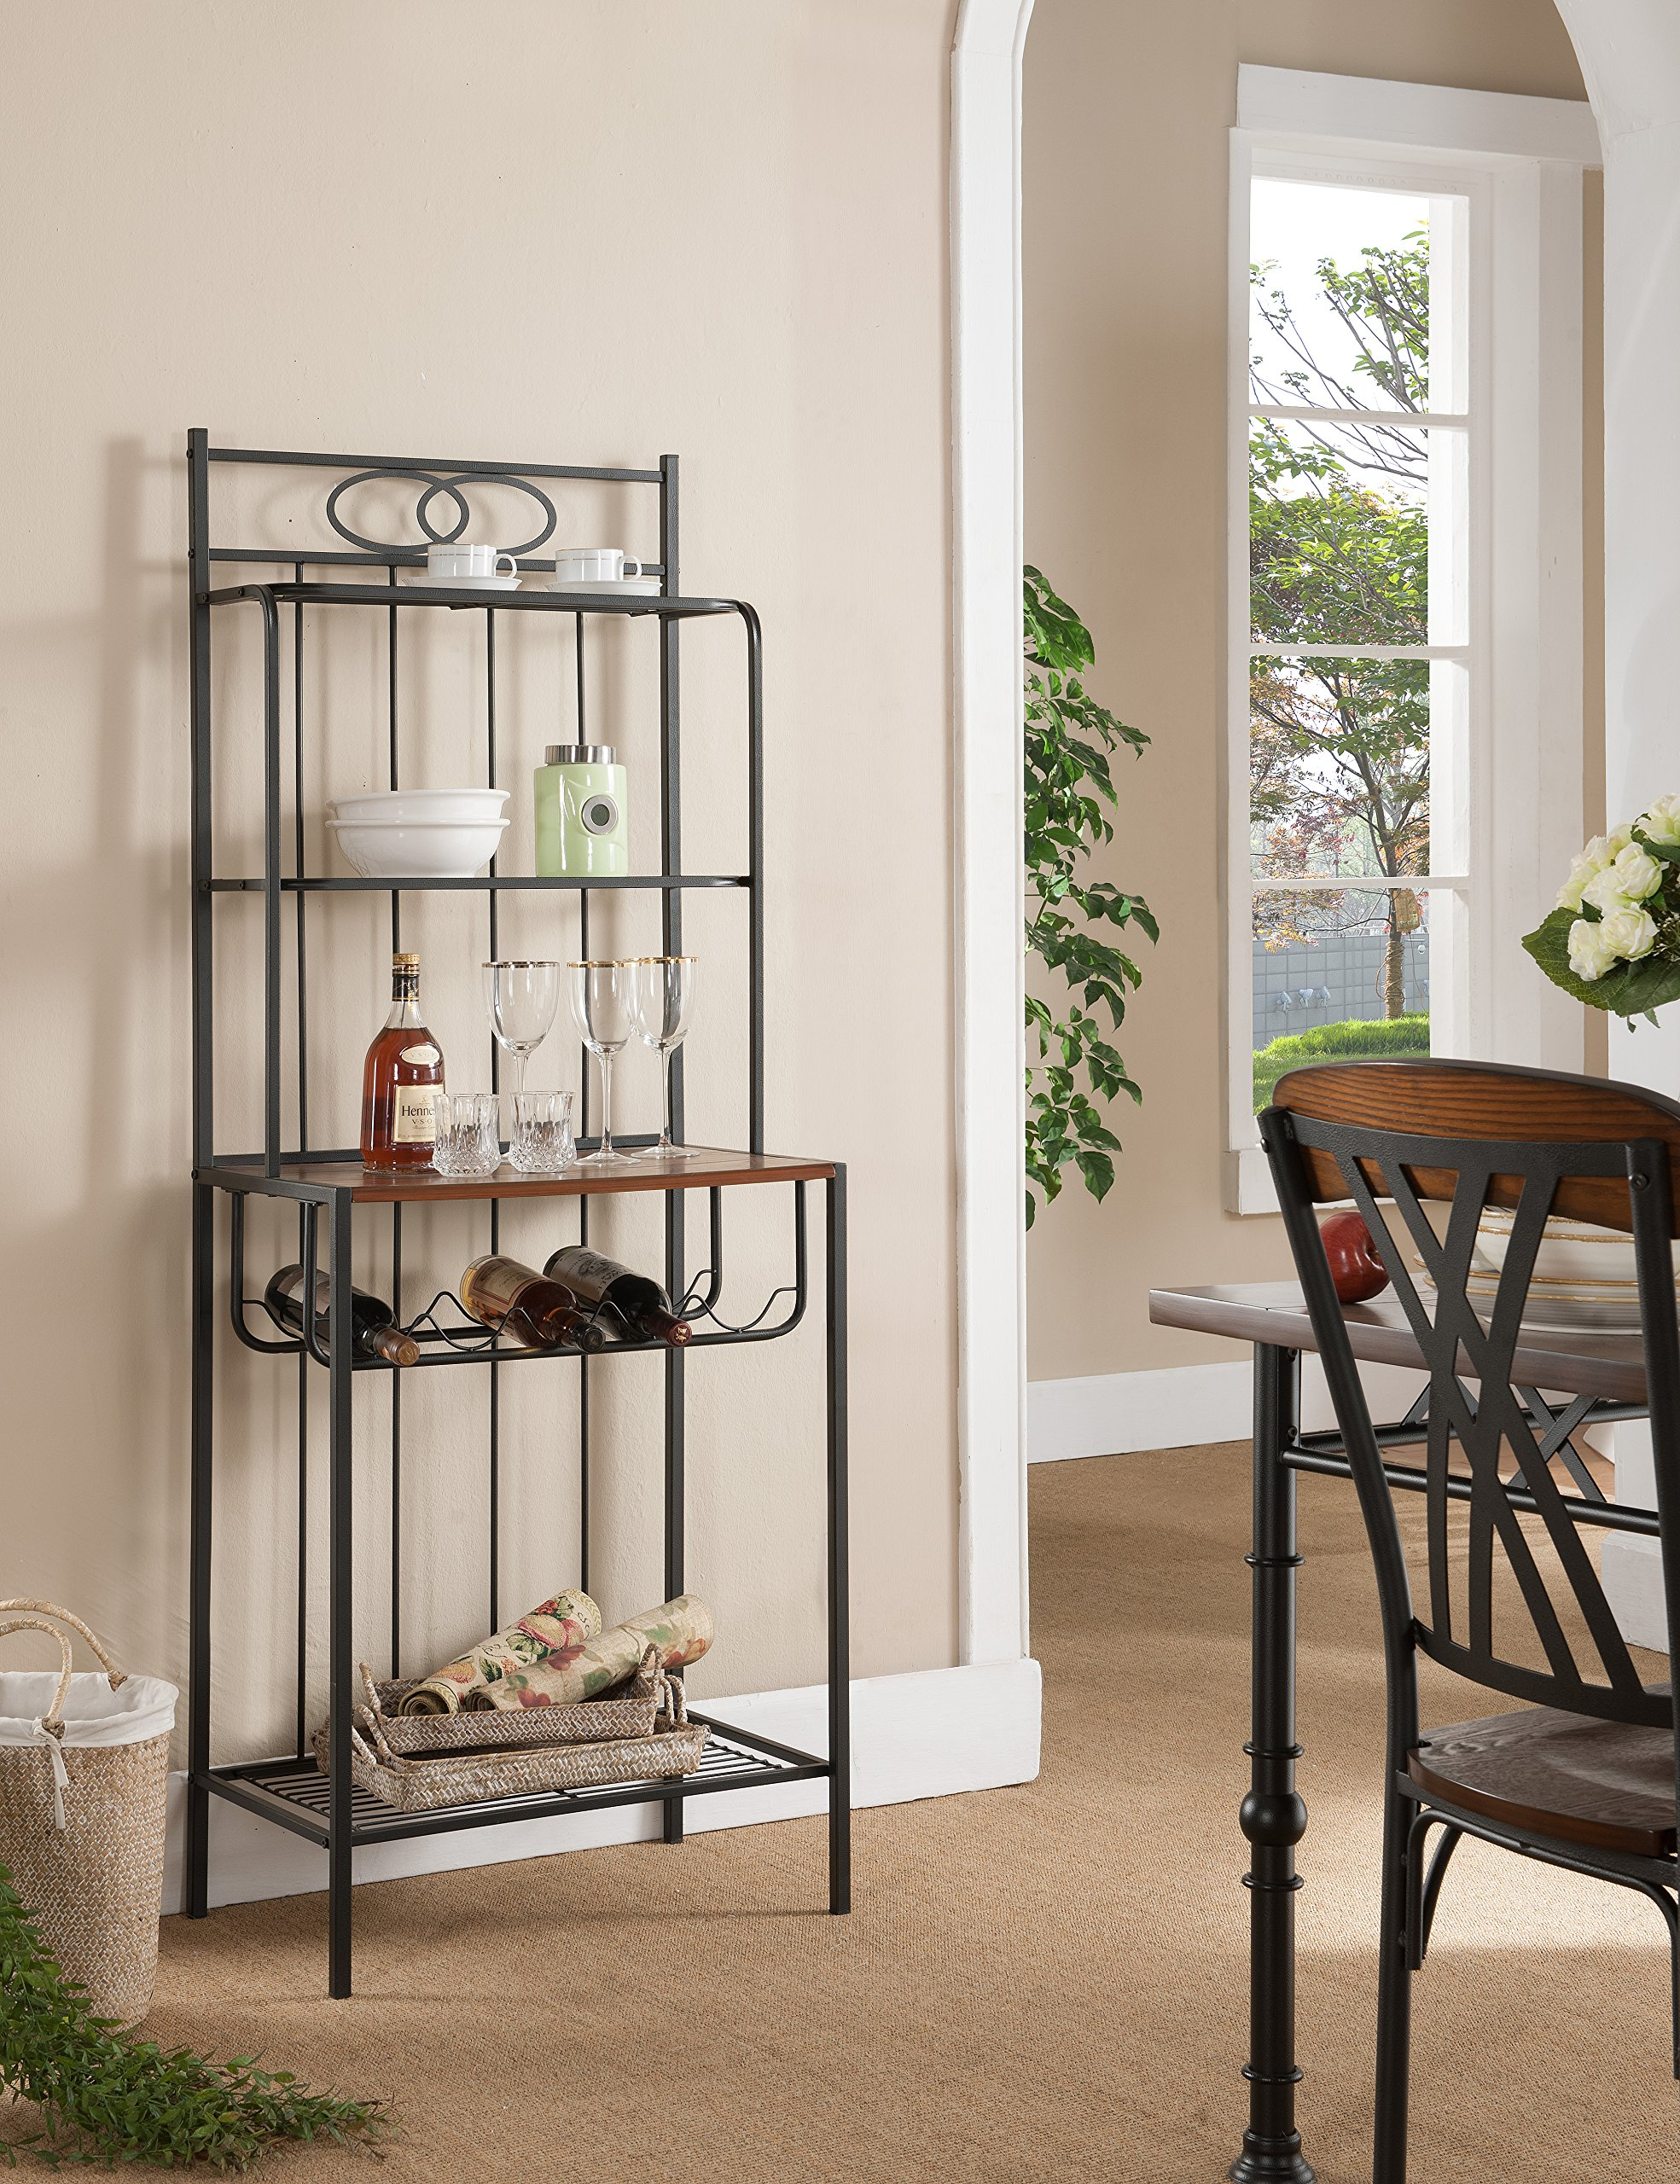 Kings Brand Furniture Metal with Wood Bakers Rack with Wine Storage by Kings Brand Furniture